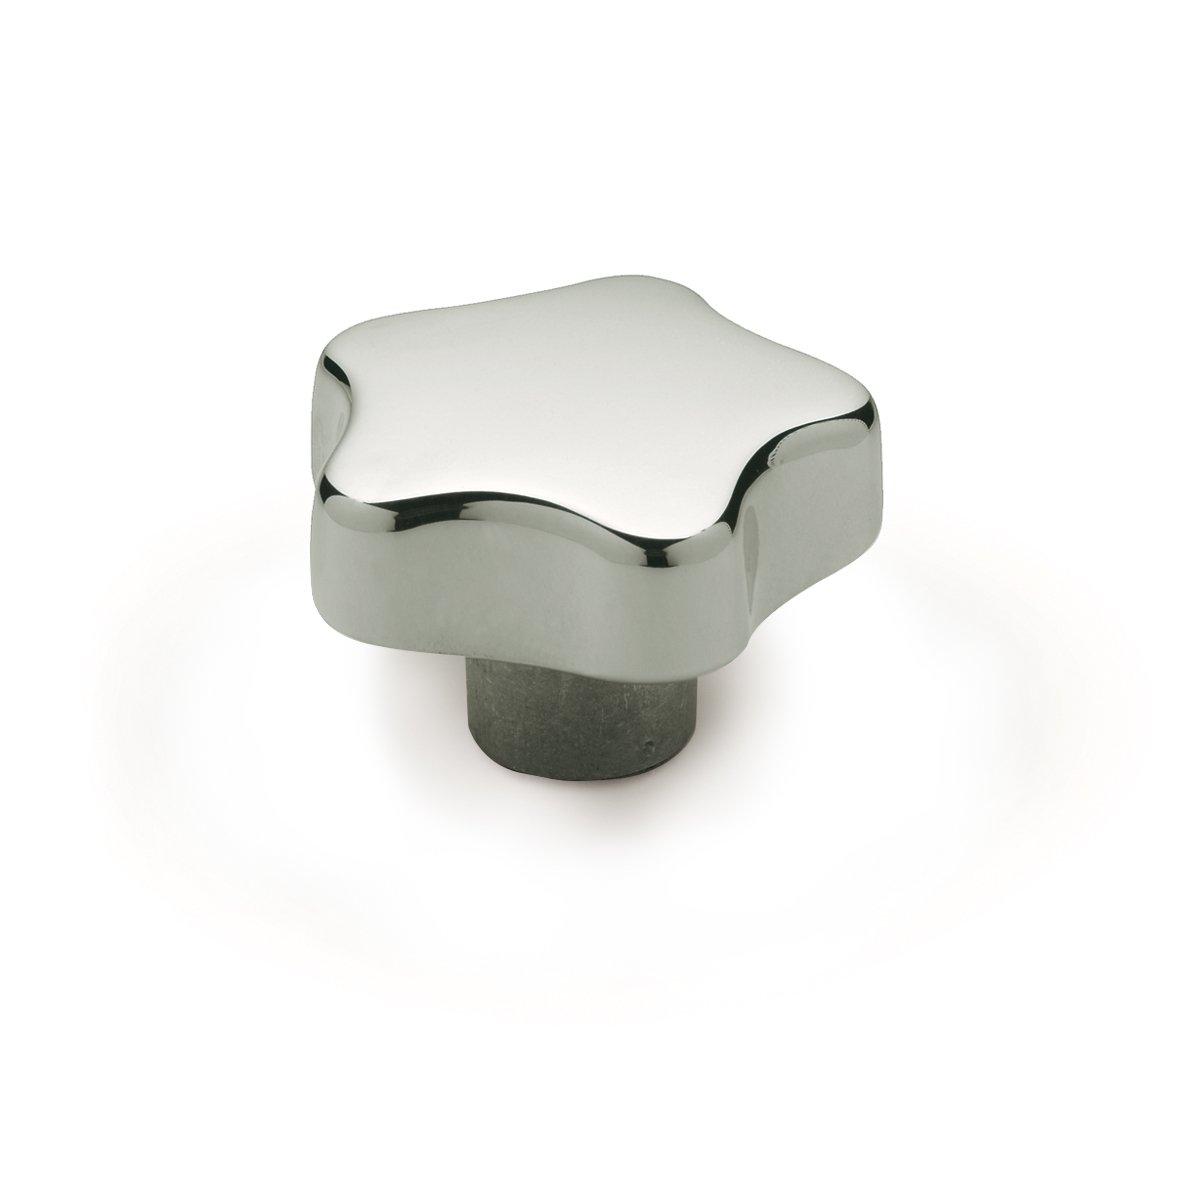 JW Winco Aluminum 6082 Tapped Hand Knob, Threaded Hole, M12 x 1.75 Thread Size x 22mm Thread Depth, 60mm Head Diameter, Polished Finish (Pack of 1)